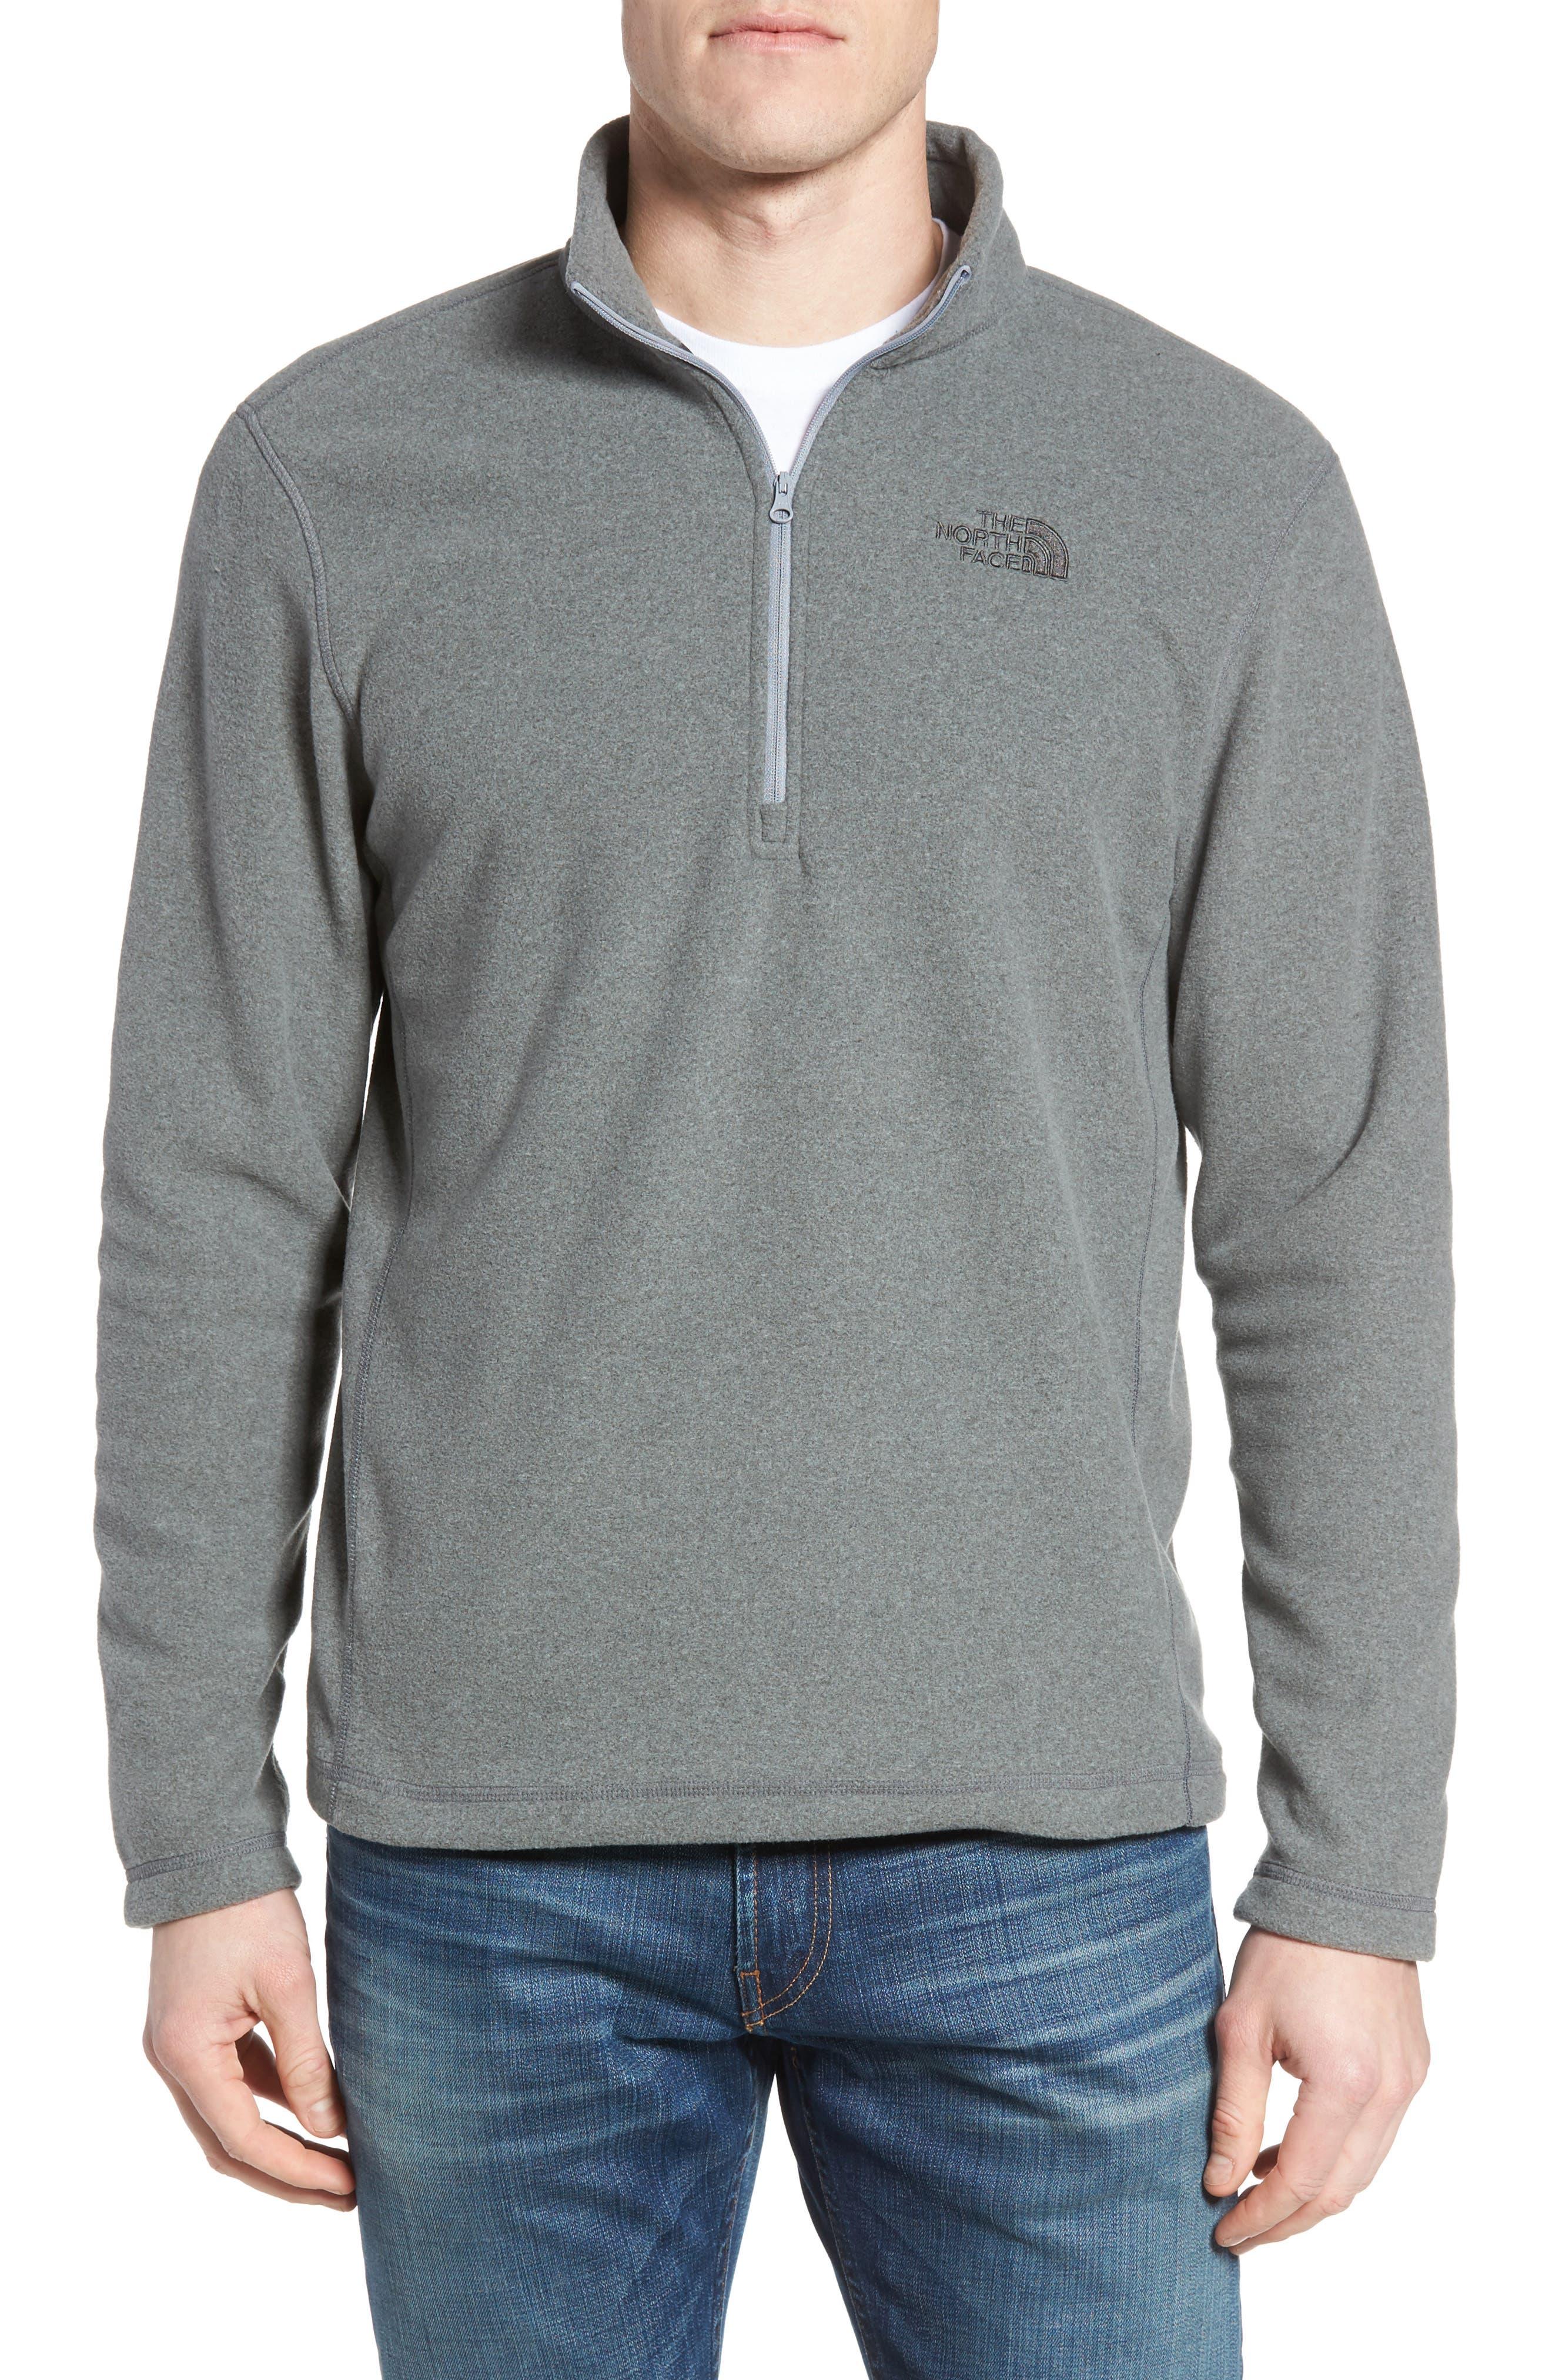 'TKA 100 Glacier' Quarter Zip Fleece Pullover,                             Main thumbnail 1, color,                             Tnf Medium Grey Heather